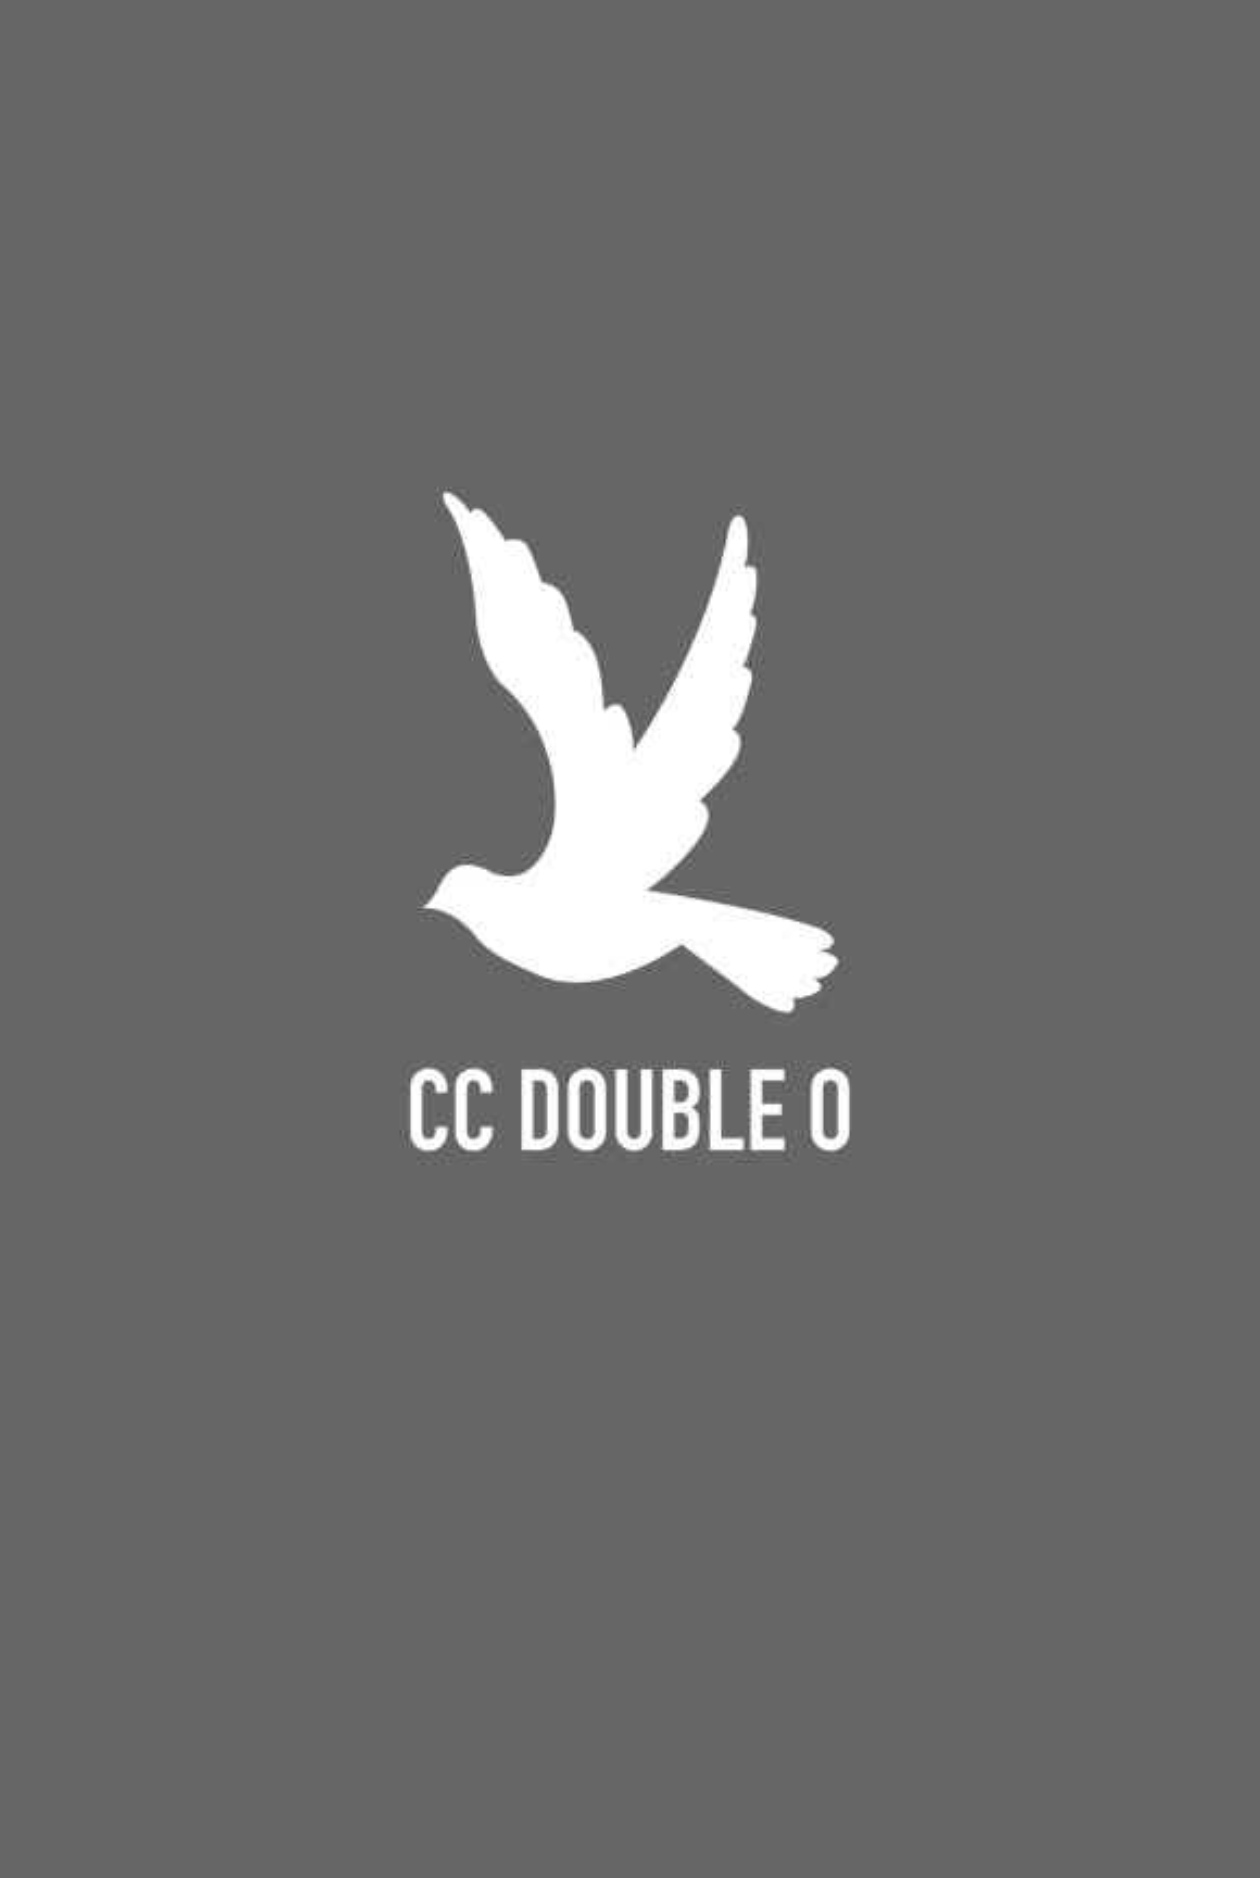 CC DOUBLE O Zip Wallet